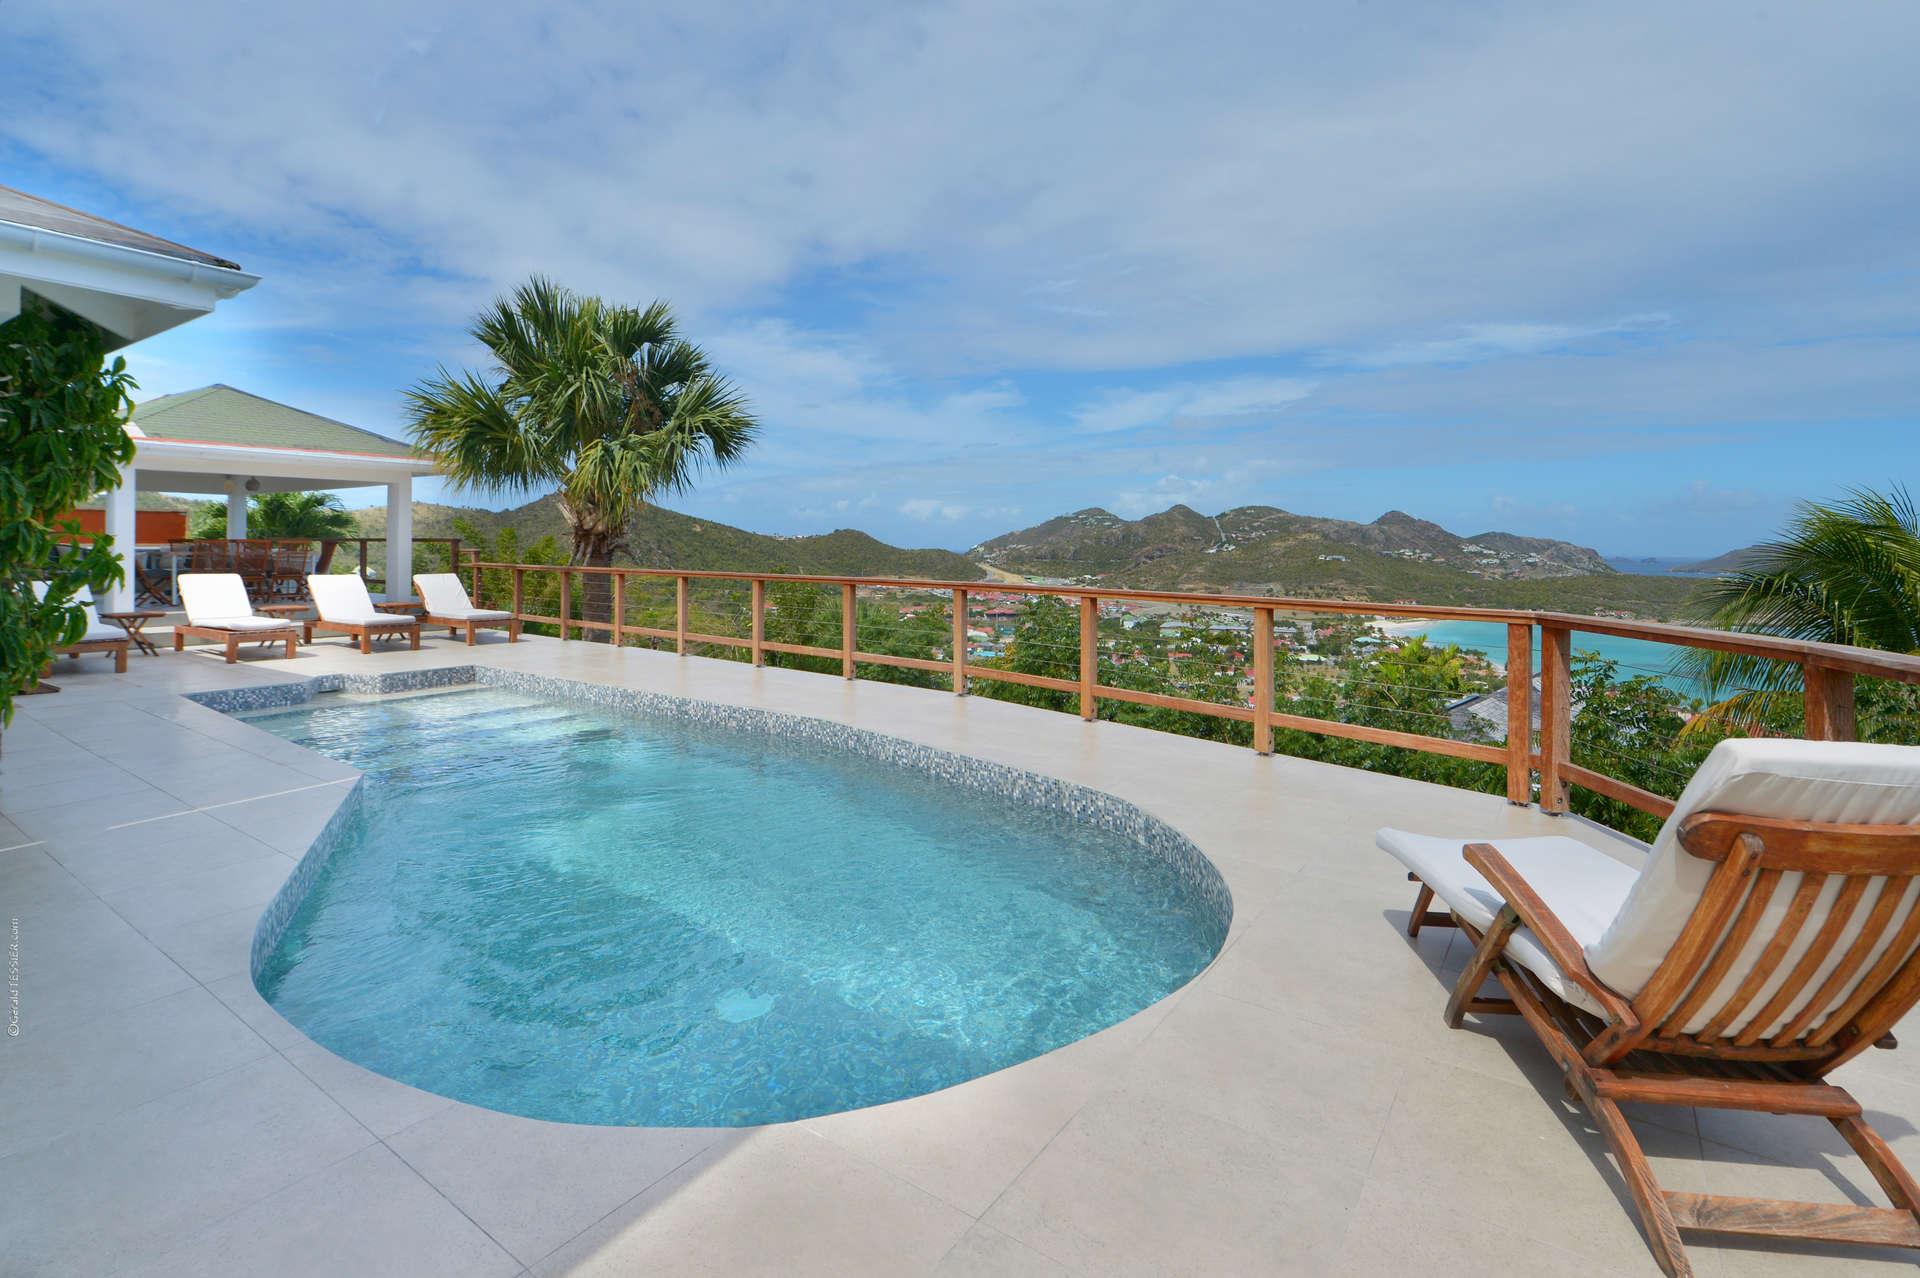 Luxury villa rentals caribbean - St barthelemy - Saint jean - Villa Sunrise - Image 1/16